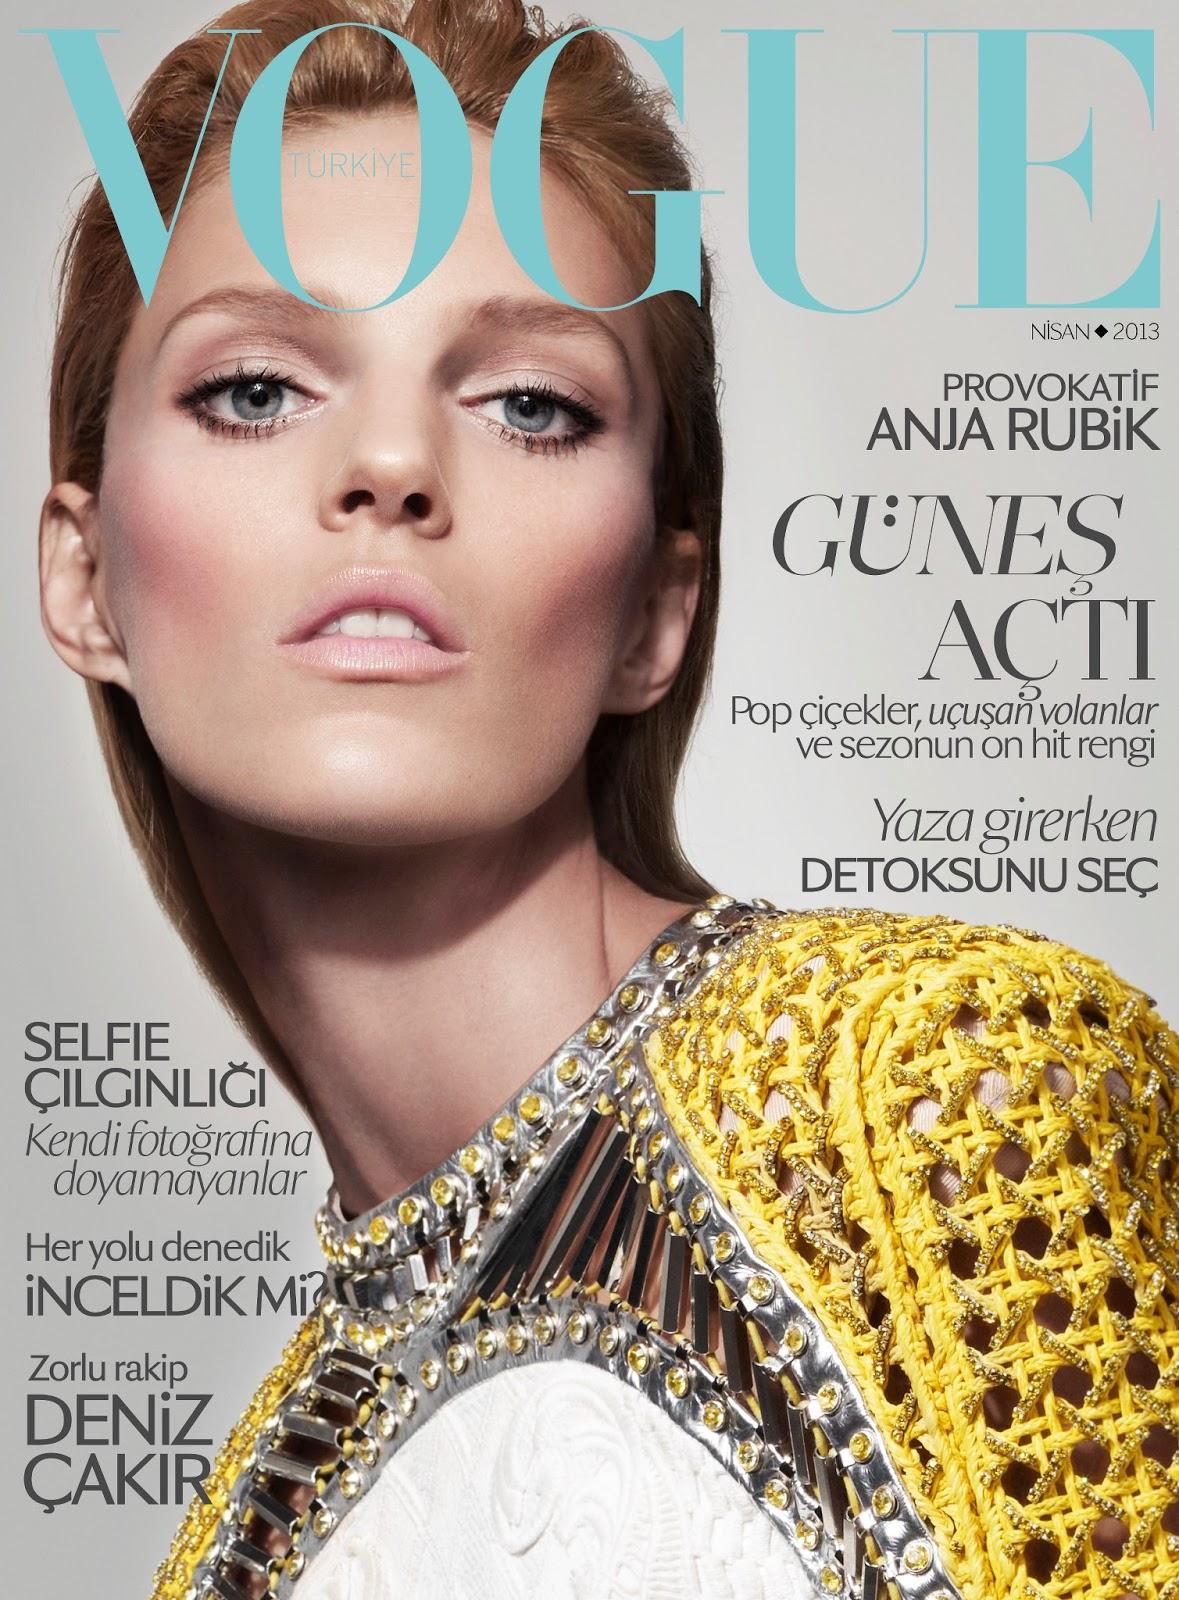 http://2.bp.blogspot.com/-PdywsYEzN8I/UVLYkndm7UI/AAAAAAABOt4/x9WbnpJ33e4/s1600/Vogue-Turkey-April-2013-Anja-Rubik-Magazine-Cover.jpg